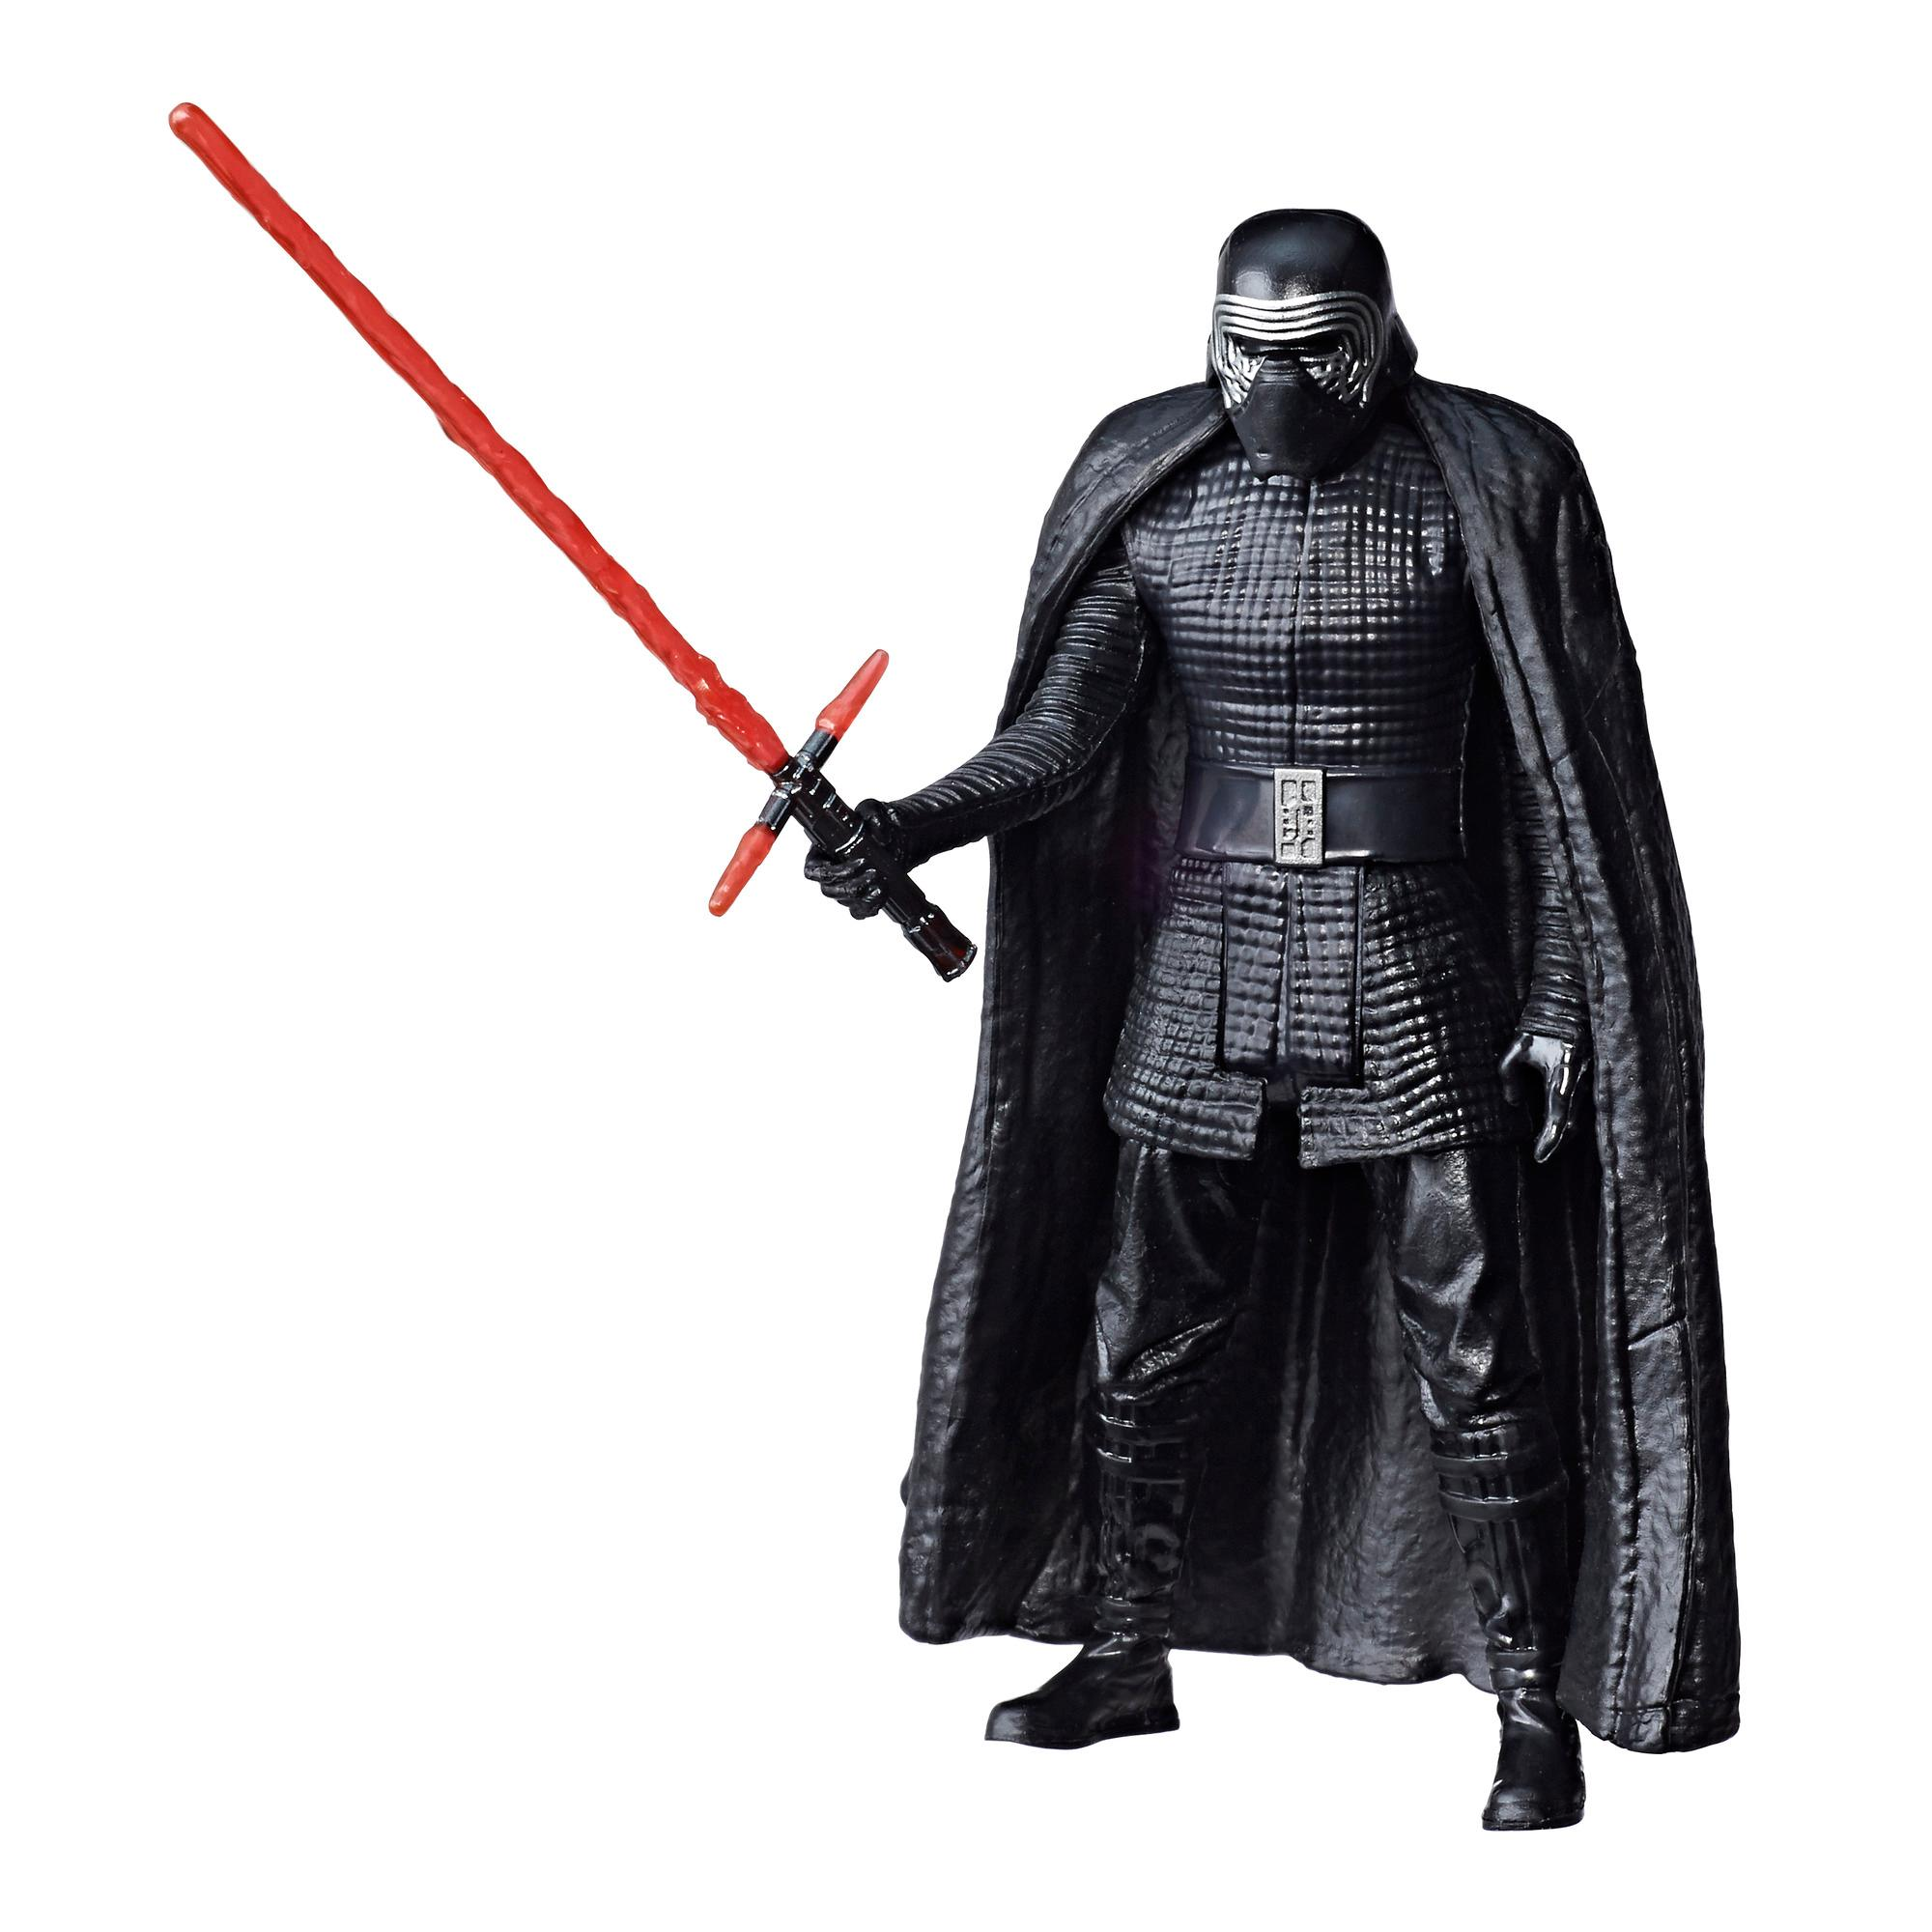 Star Wars Solo Film 3.75 FORCE LINK 2.0 Figur Kylo Ren